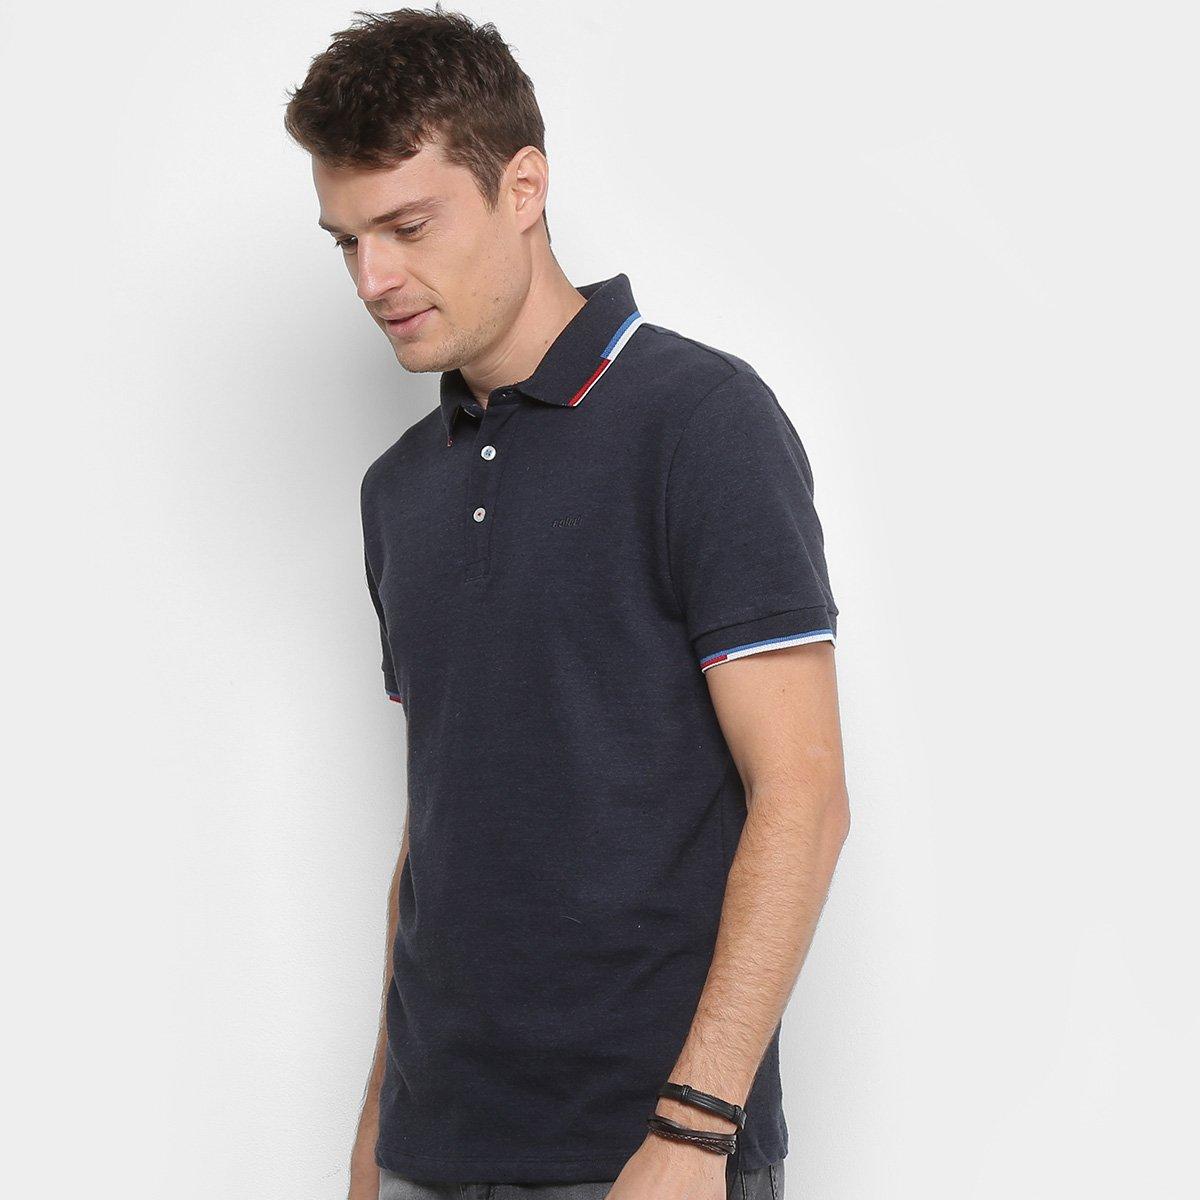 144da4e343 Camisa Polo Colcci Masculina